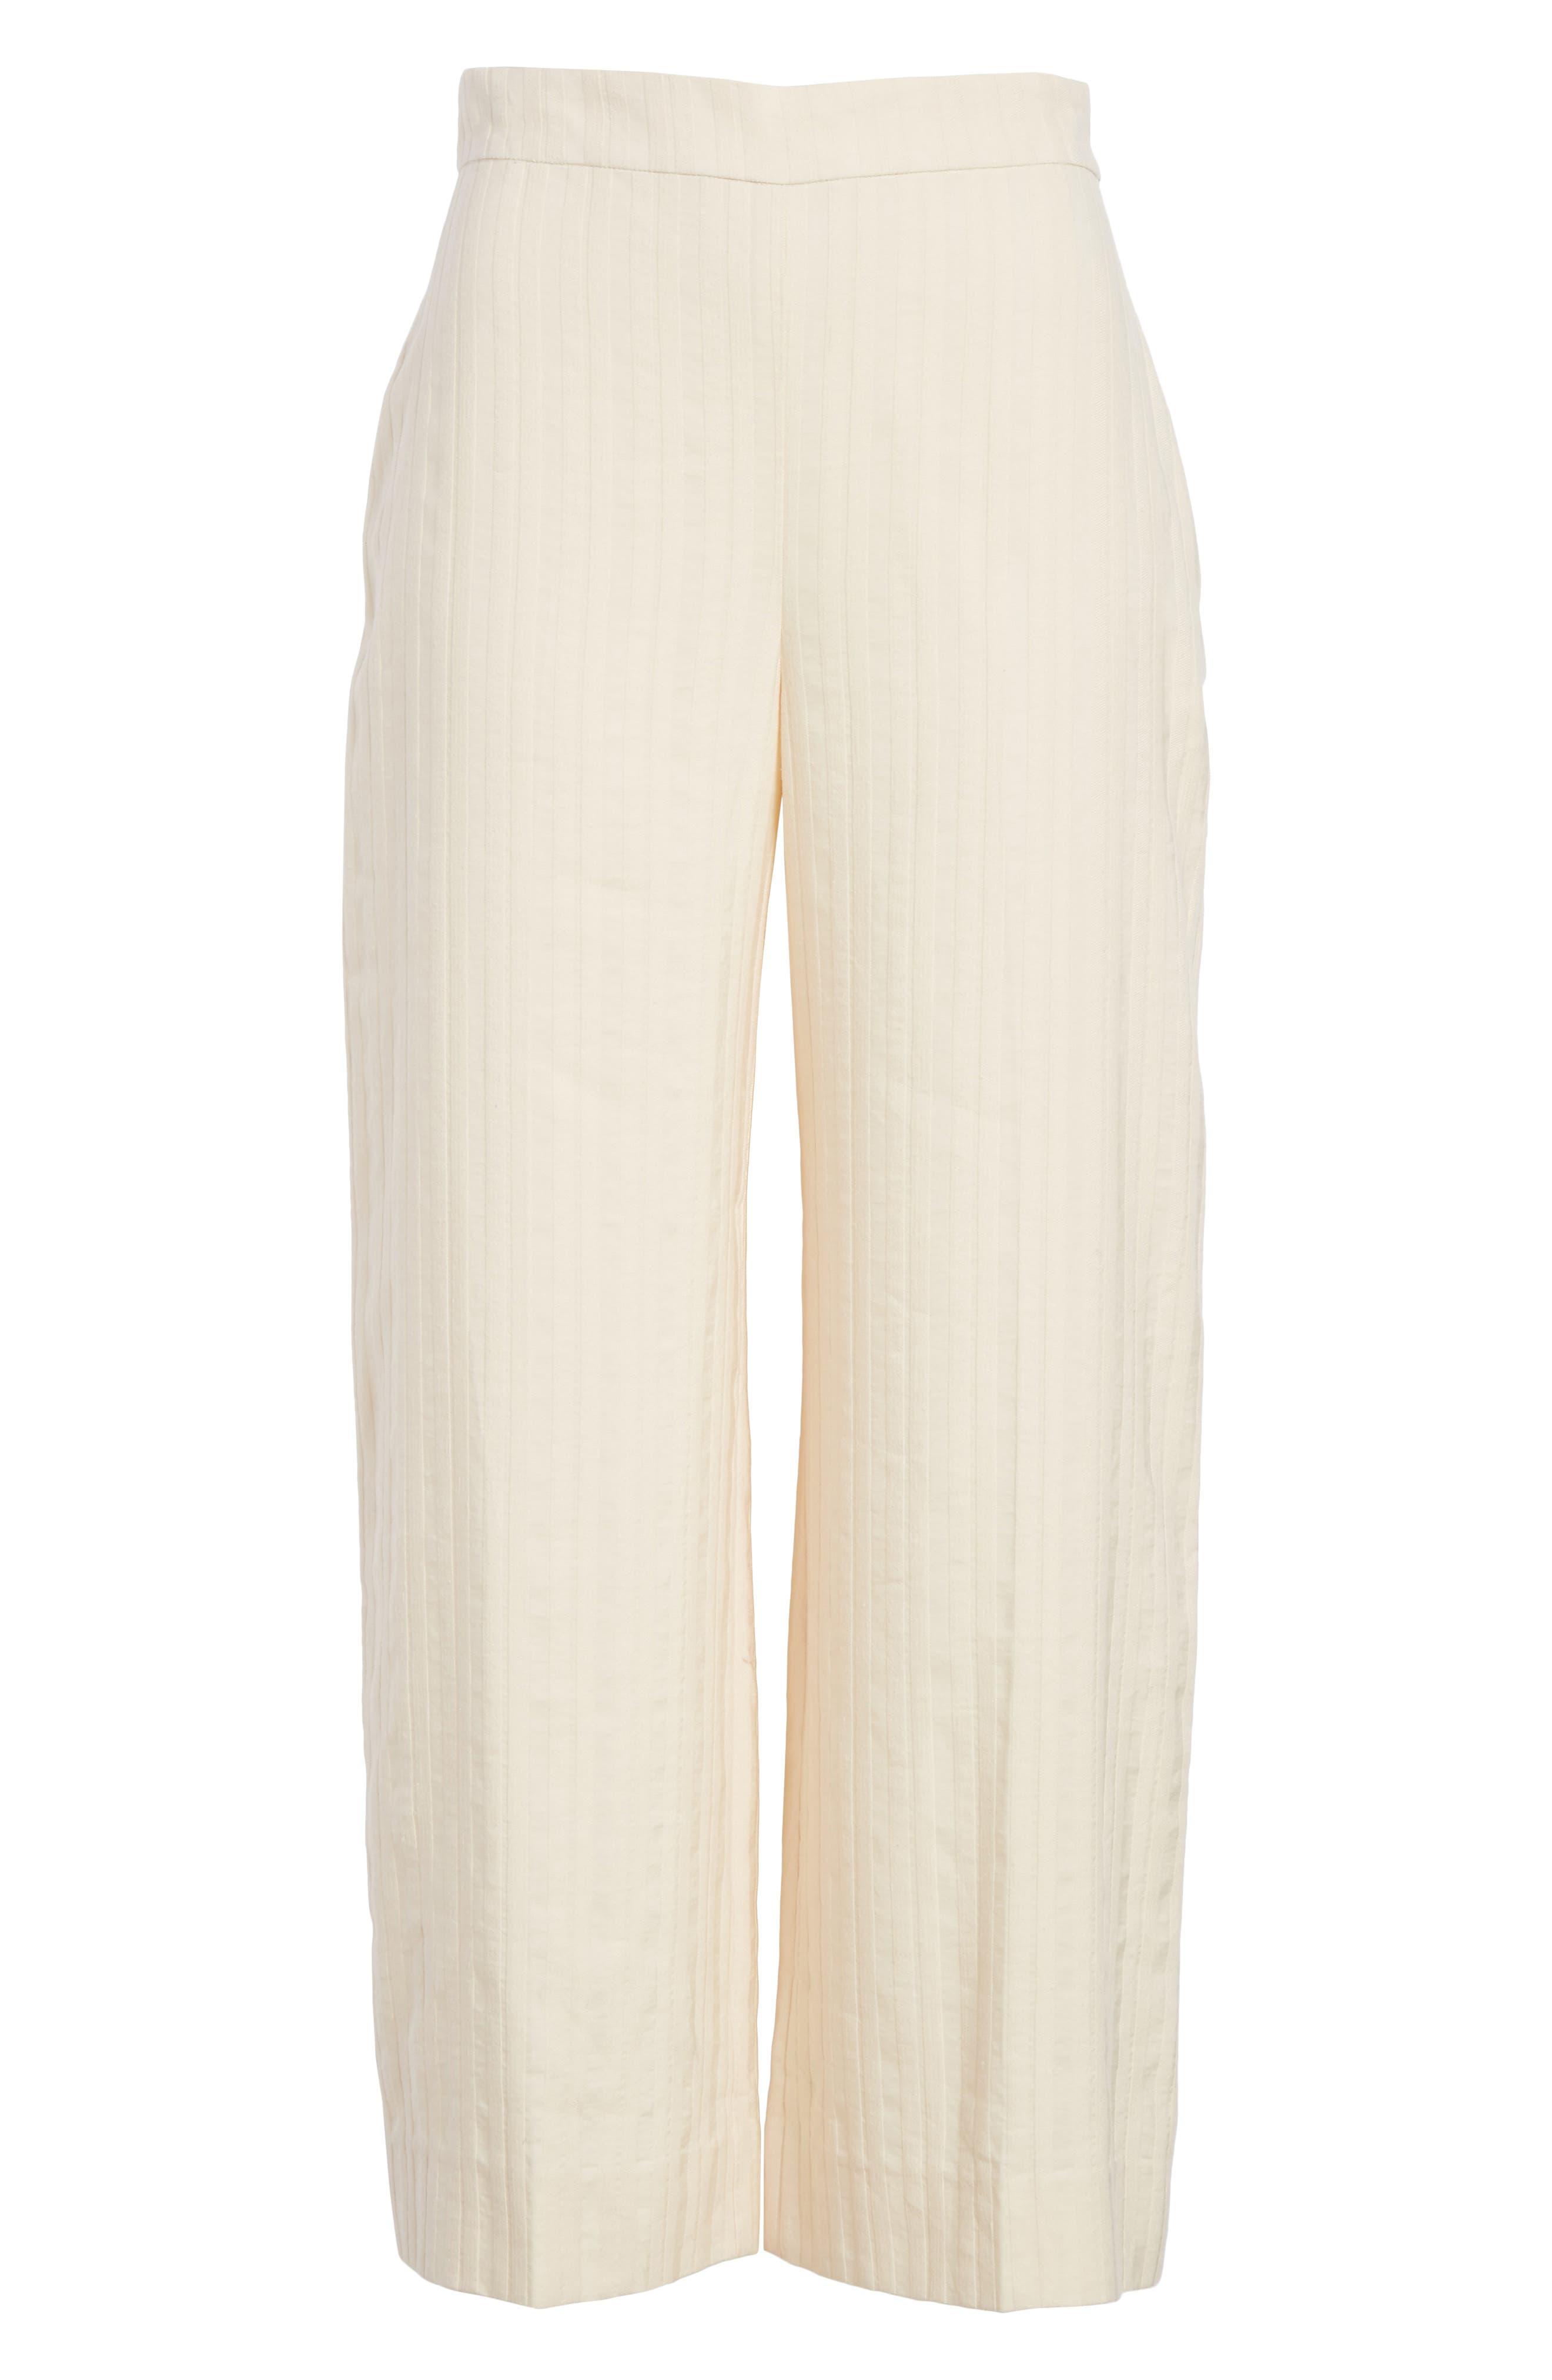 Textured Stripe Crop Pants,                             Alternate thumbnail 6, color,                             Creme Brulee